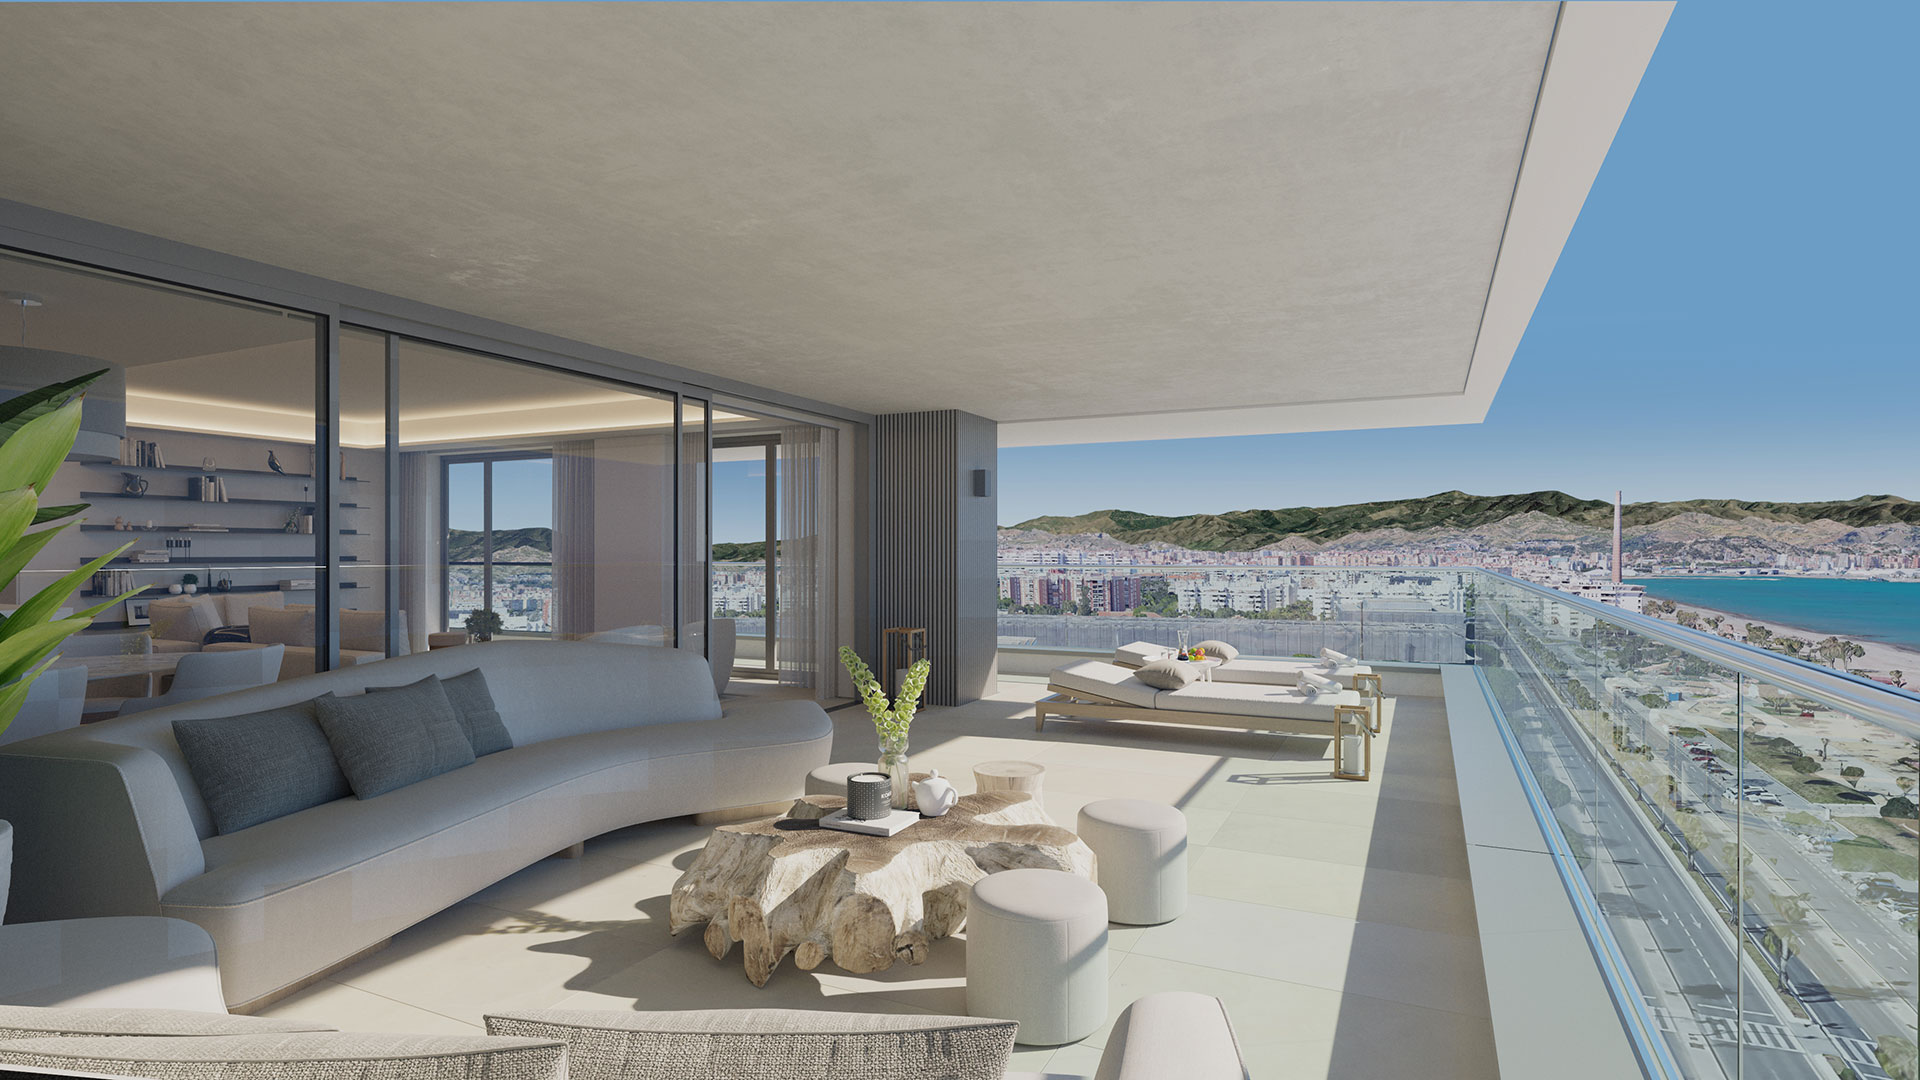 Malaga_towers_interiores_terraza_01